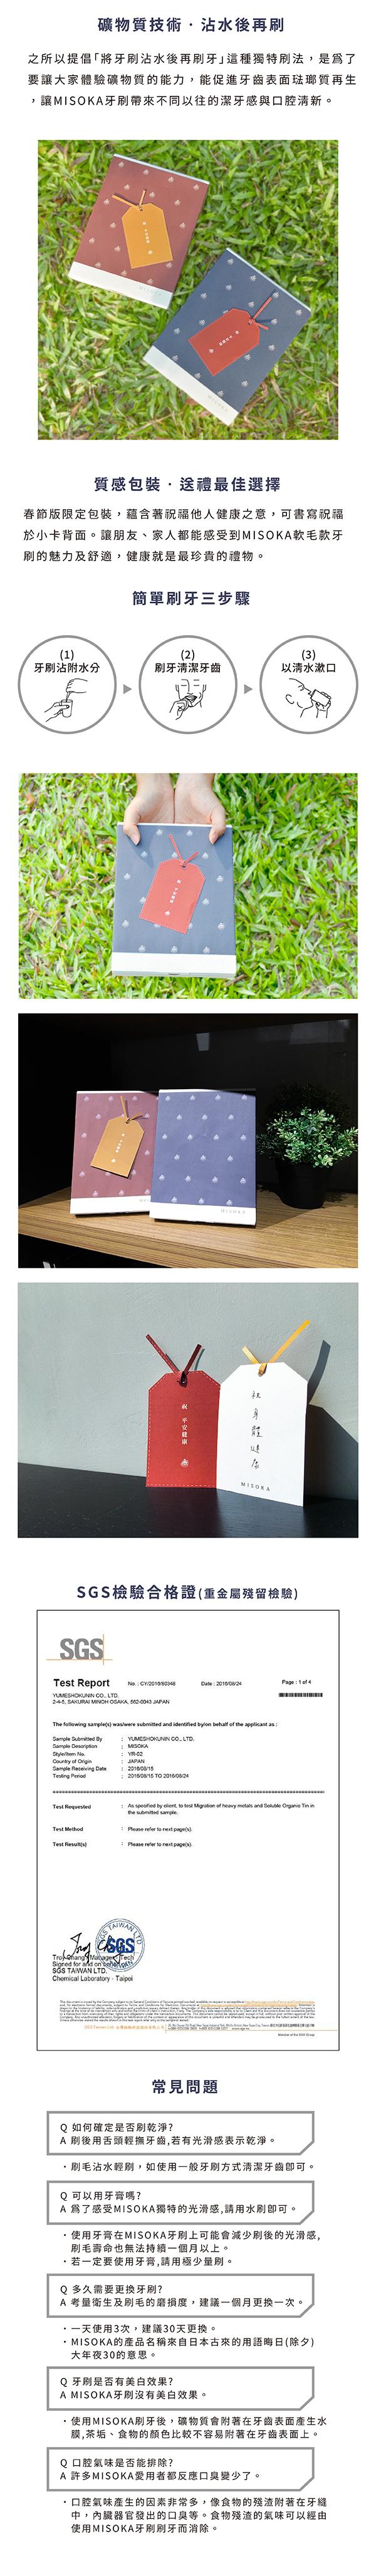 MISOKA|軟毛款頂級免沾牙膏牙刷禮盒 (日本製 / 3入)【春節限定版】